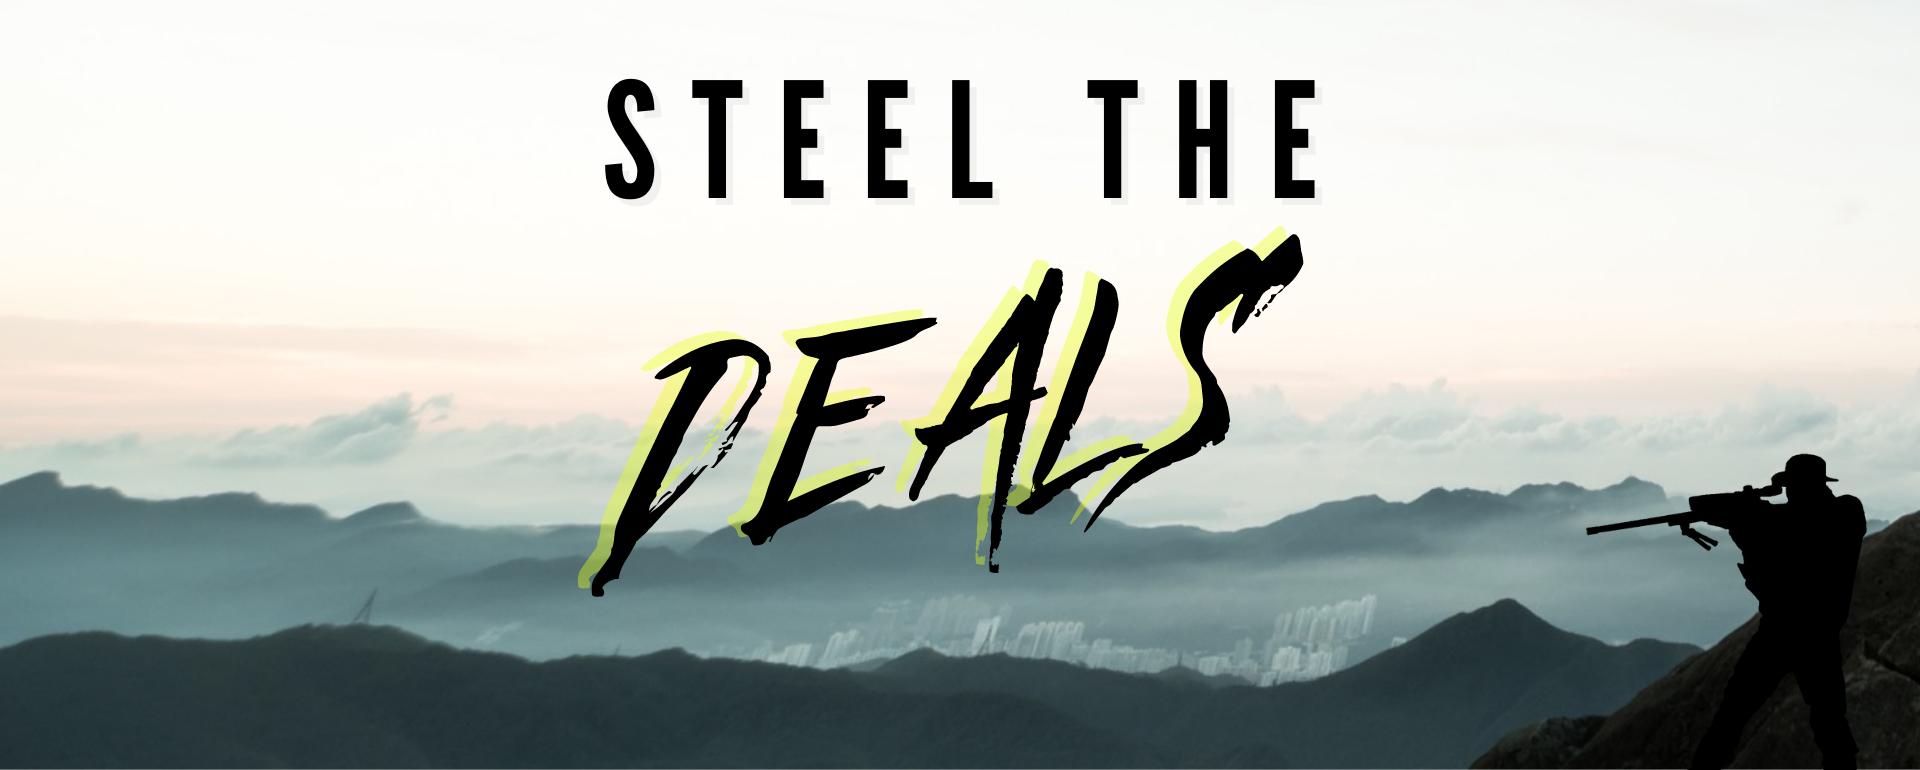 steel-the-deals2.png